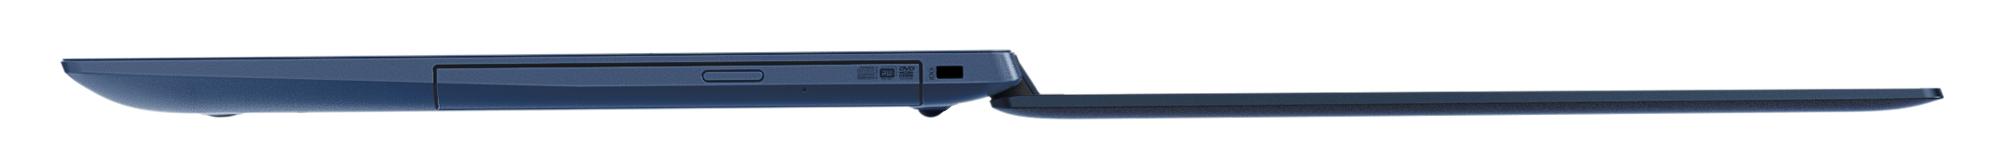 Фото  Ноутбук Lenovo ideapad 330-15 Midnight Blue (81DC00R1RA)